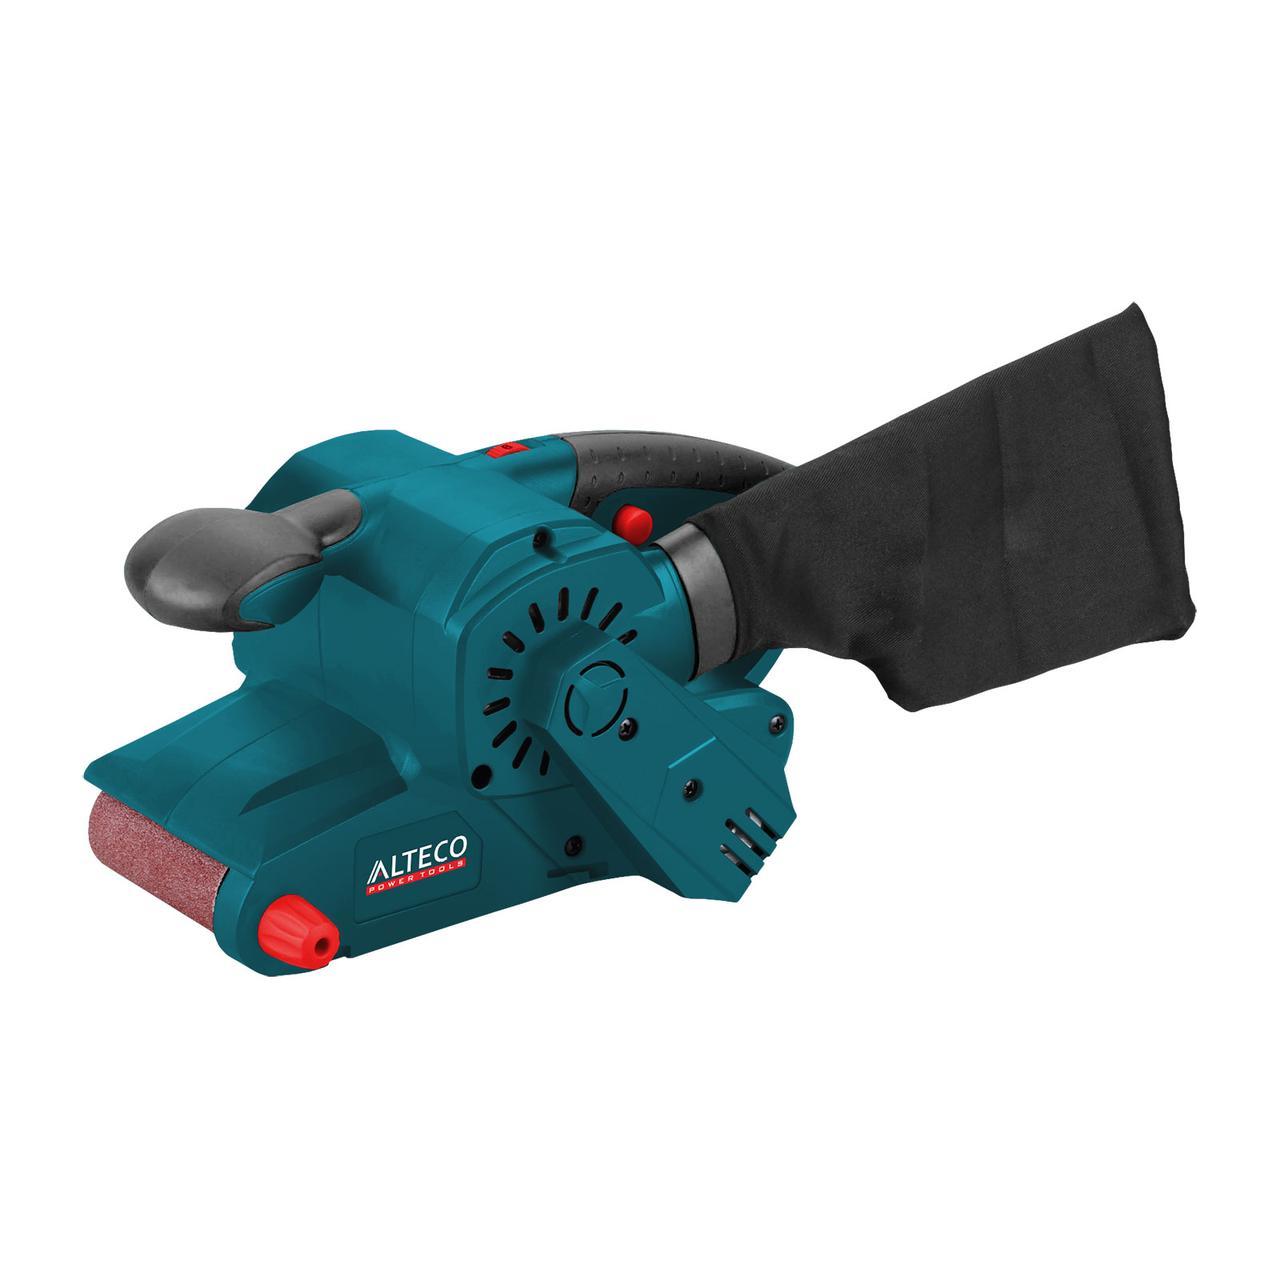 ALTECO BS 950 Ленточная шлифмашина